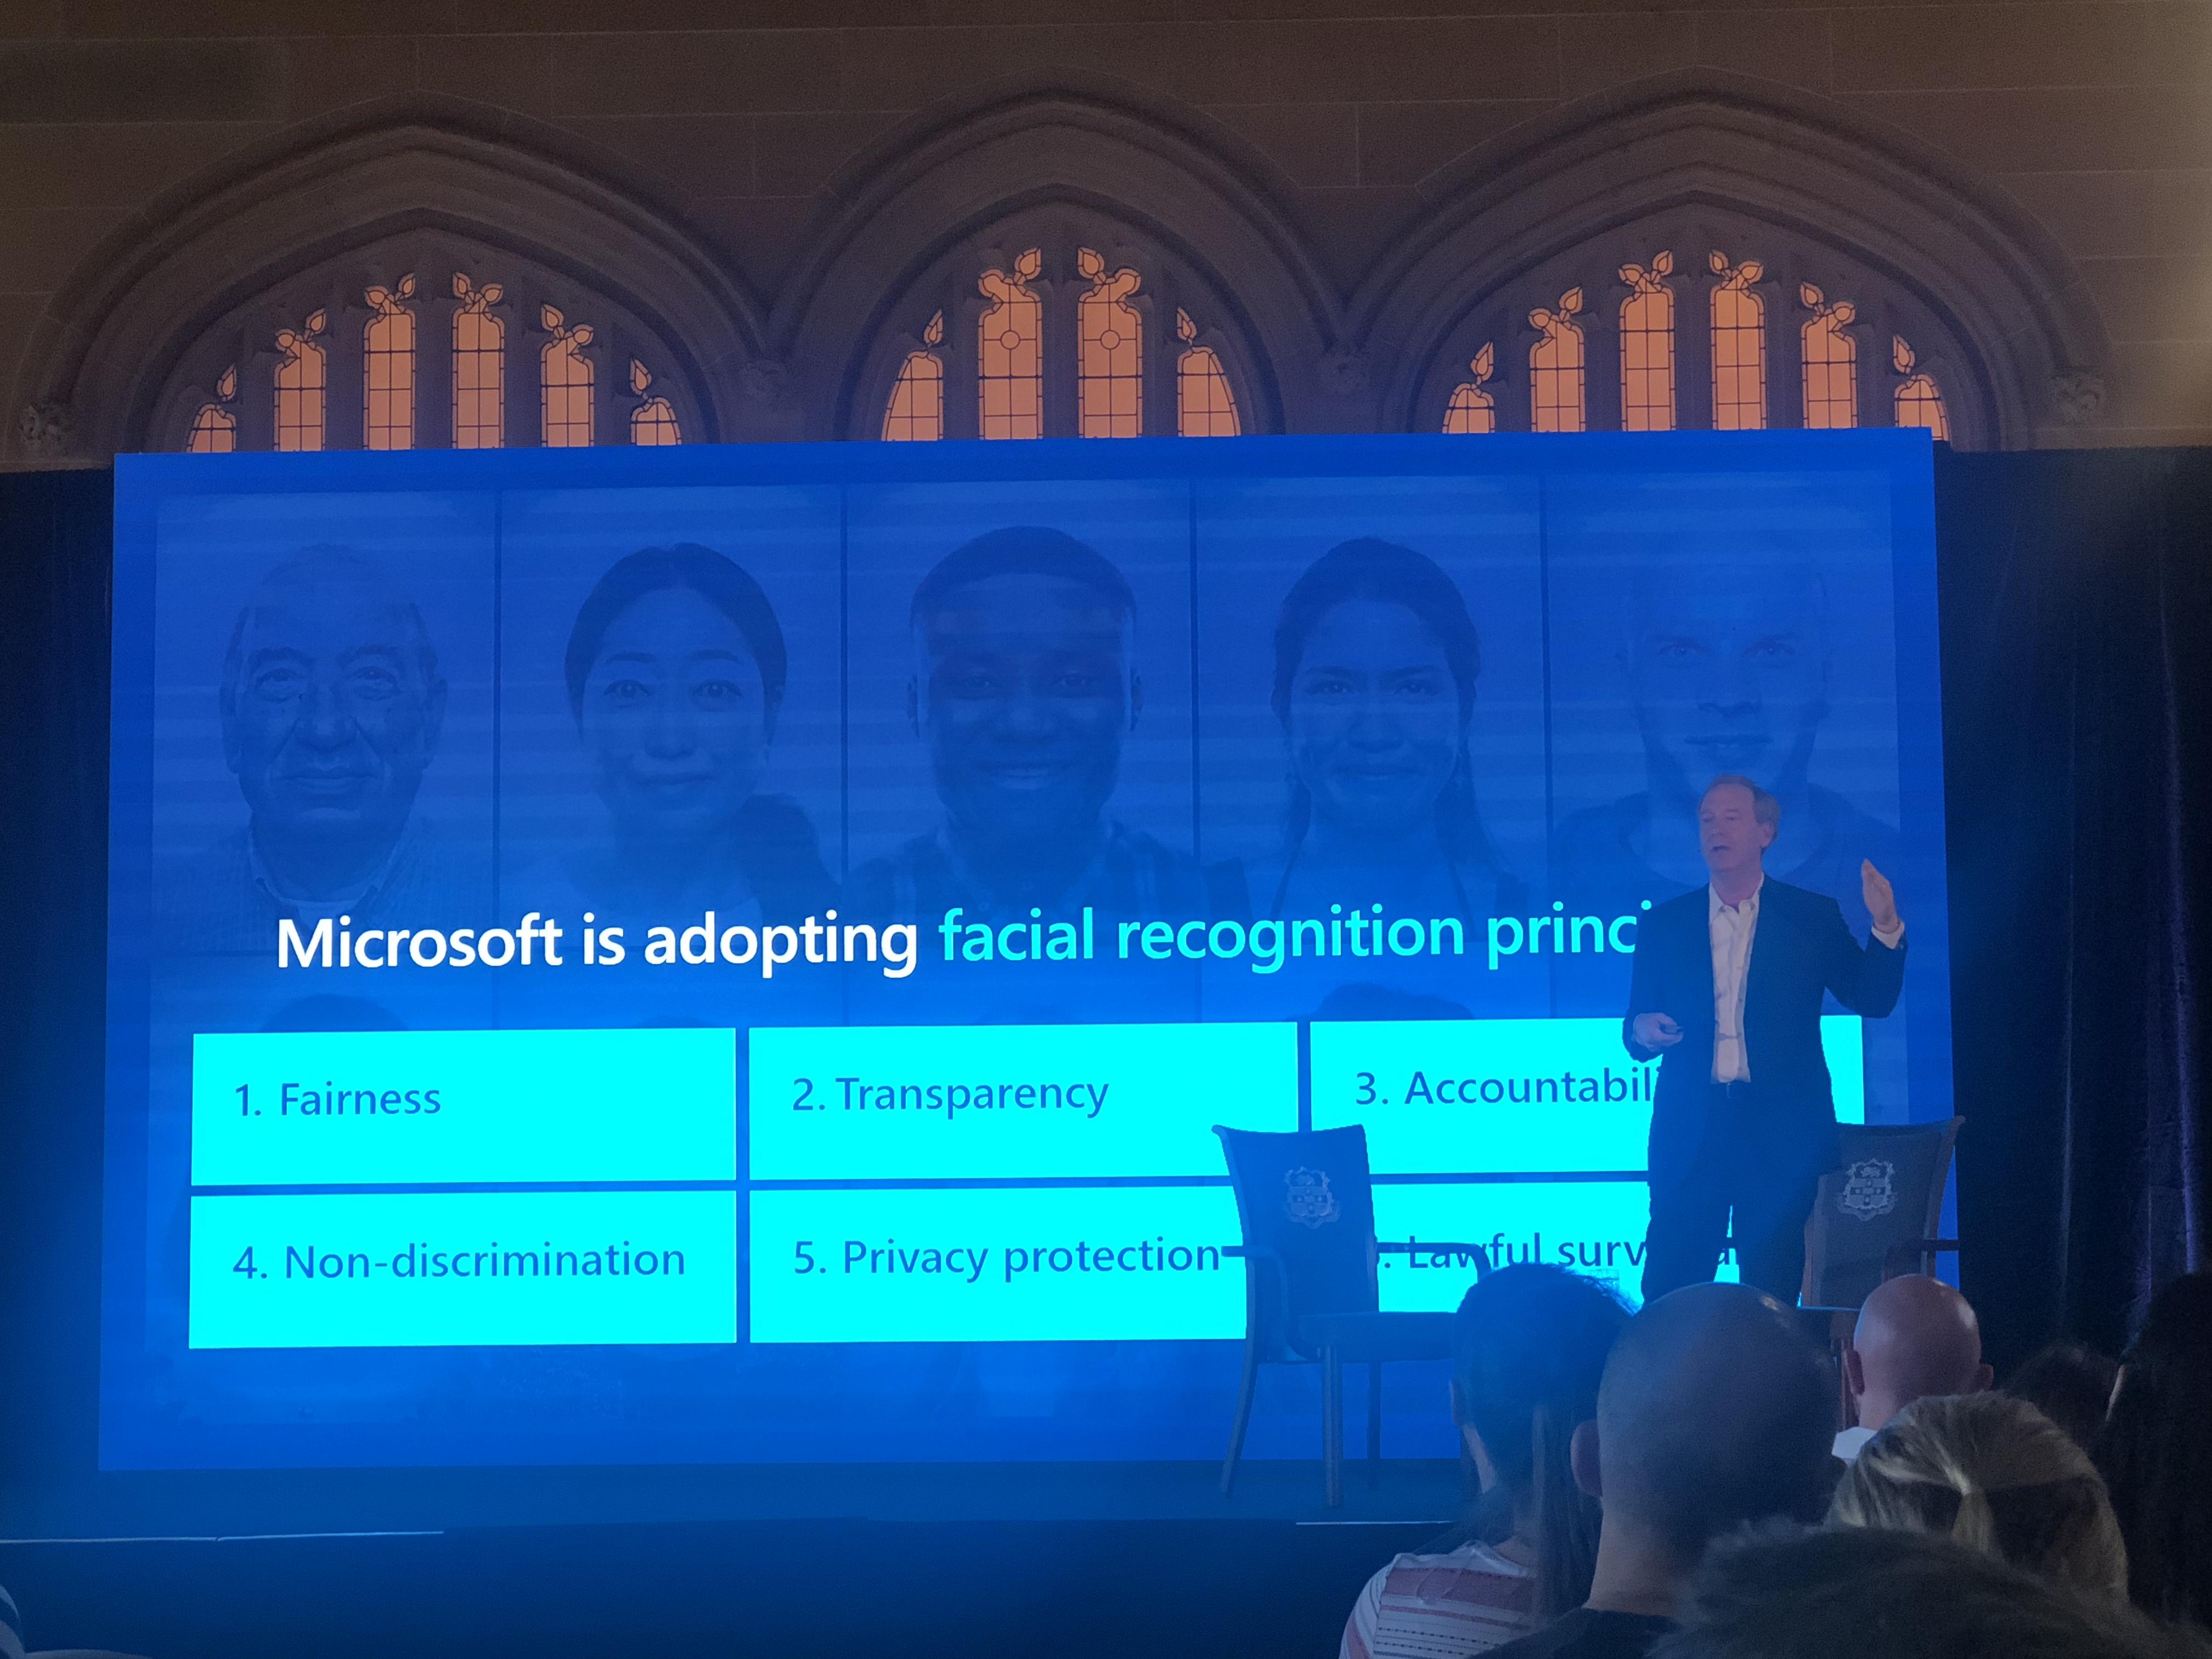 Brad is introducing the principles of facial recognition | Ranyang Liu